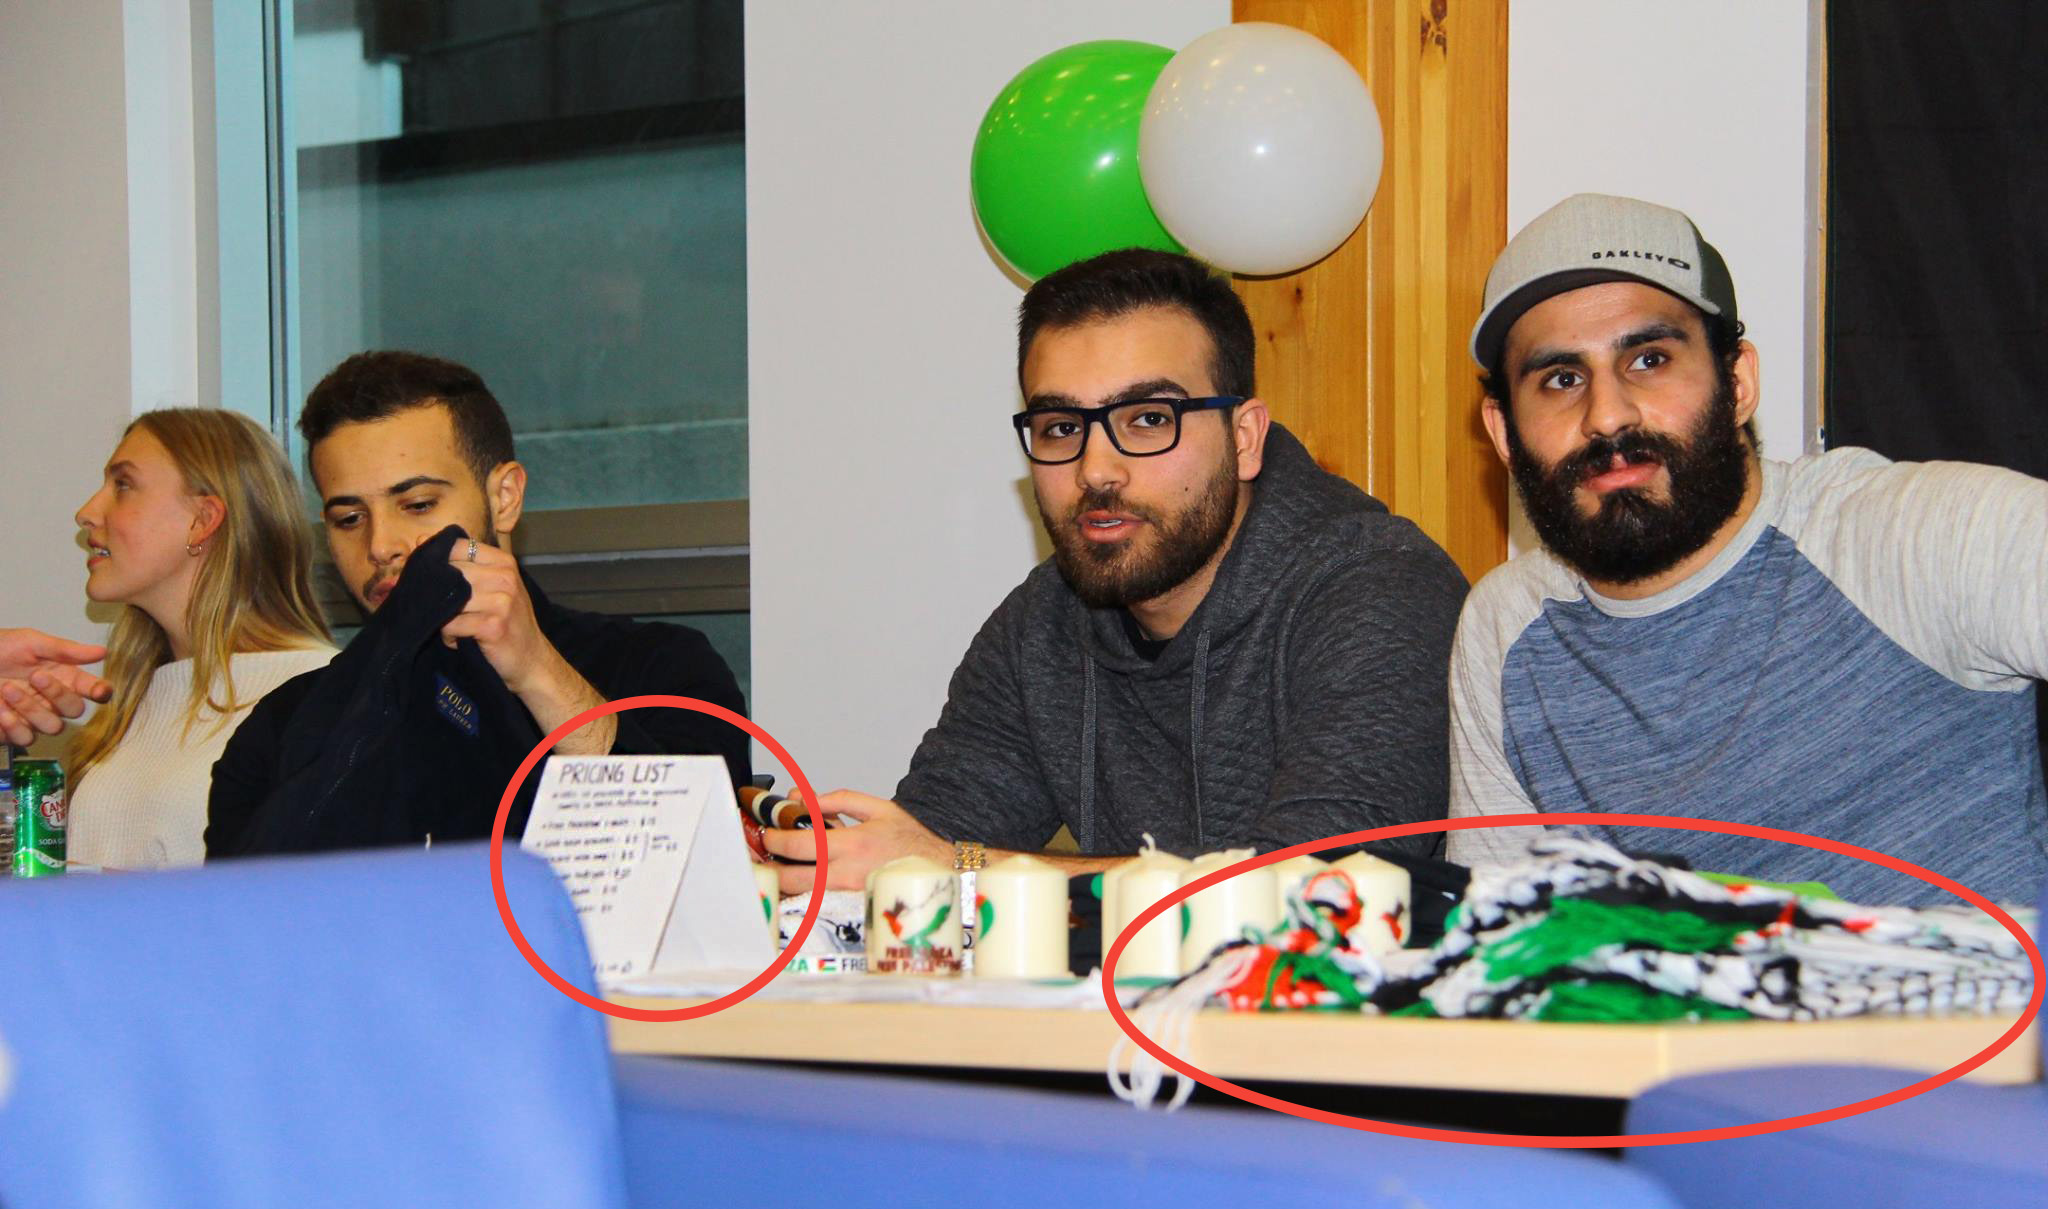 UBC_Hamas_3_with_circle.jpg